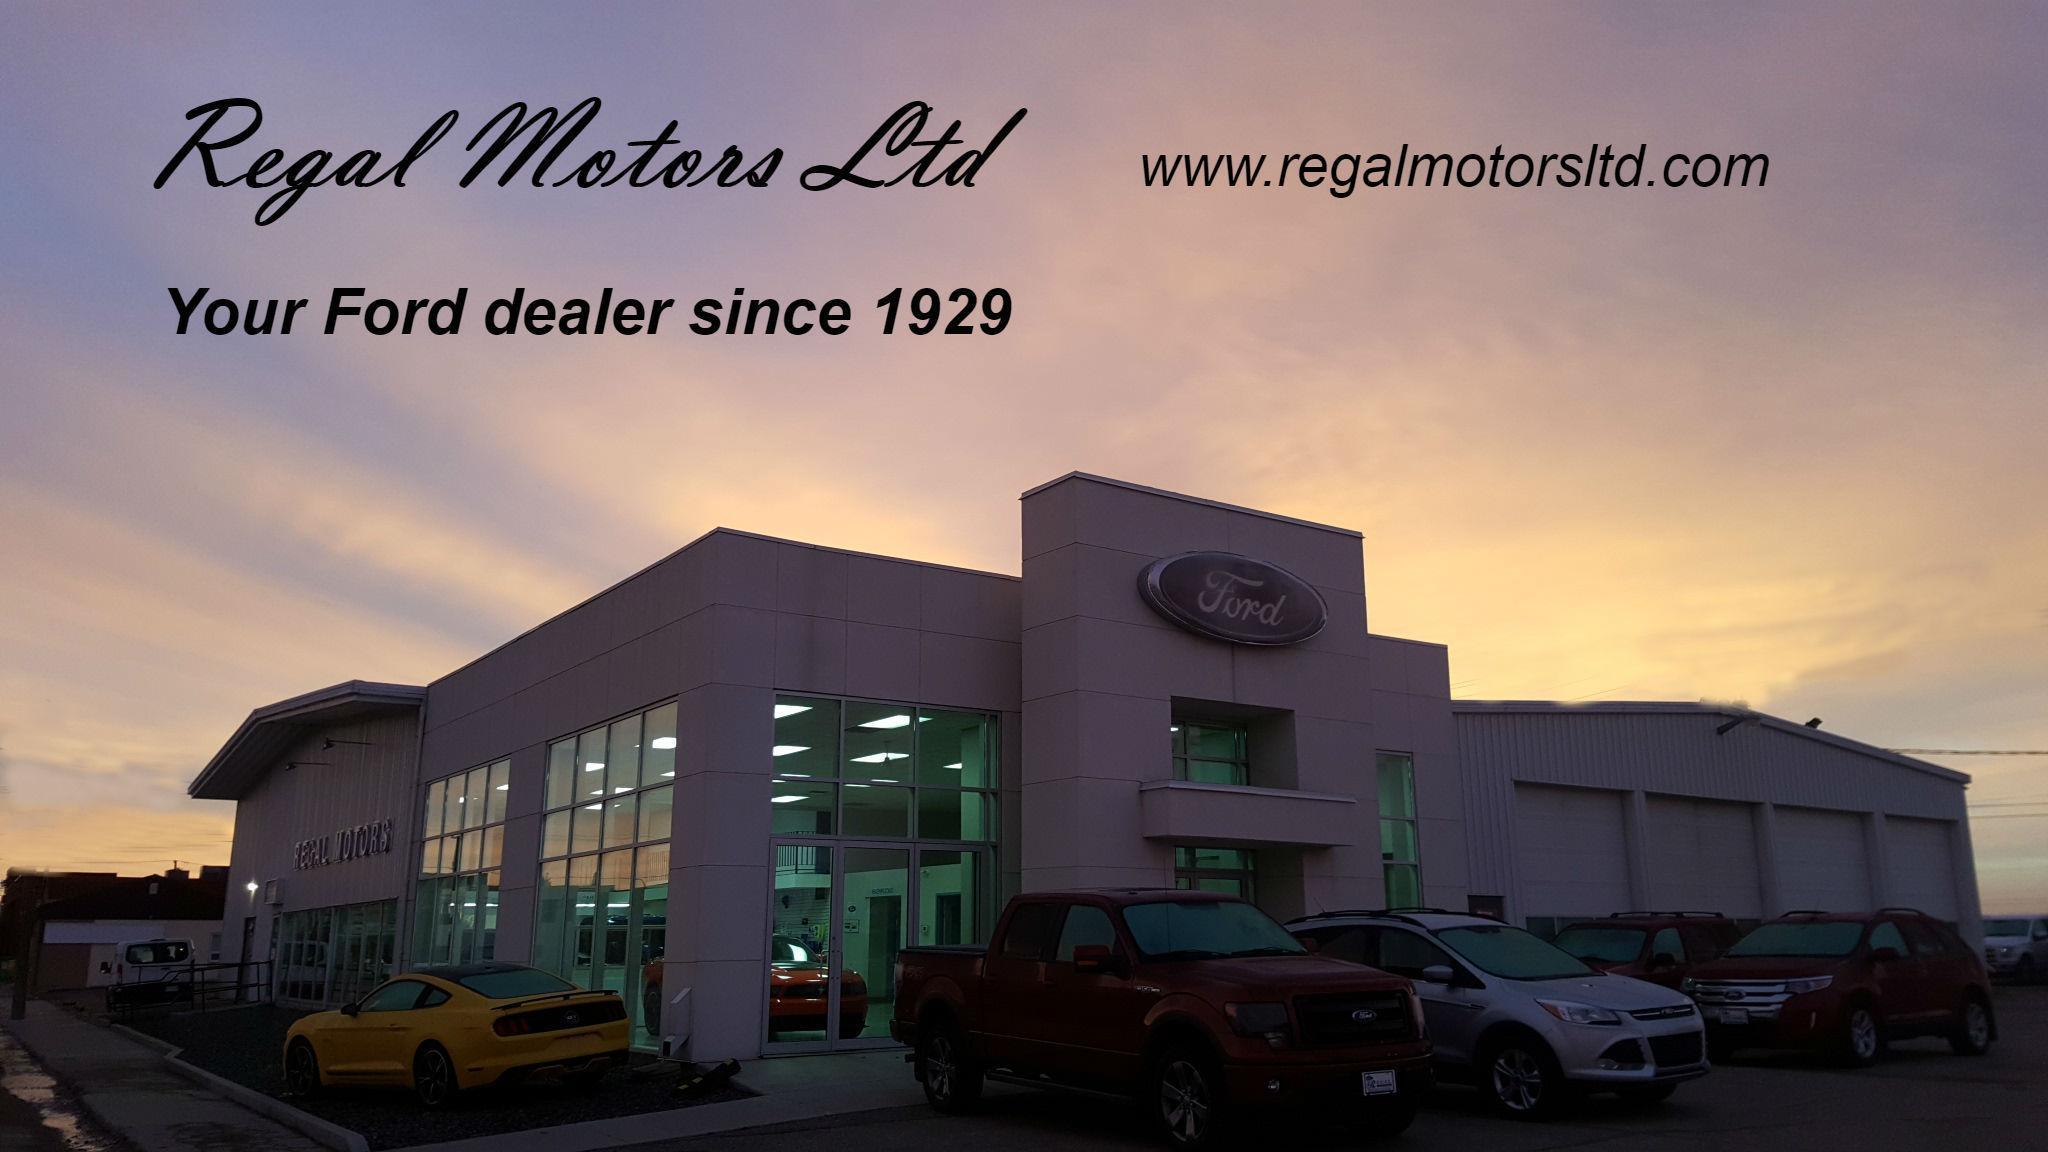 Regal Motors Your West Central Saskatchewan Ford Dealer since 1929